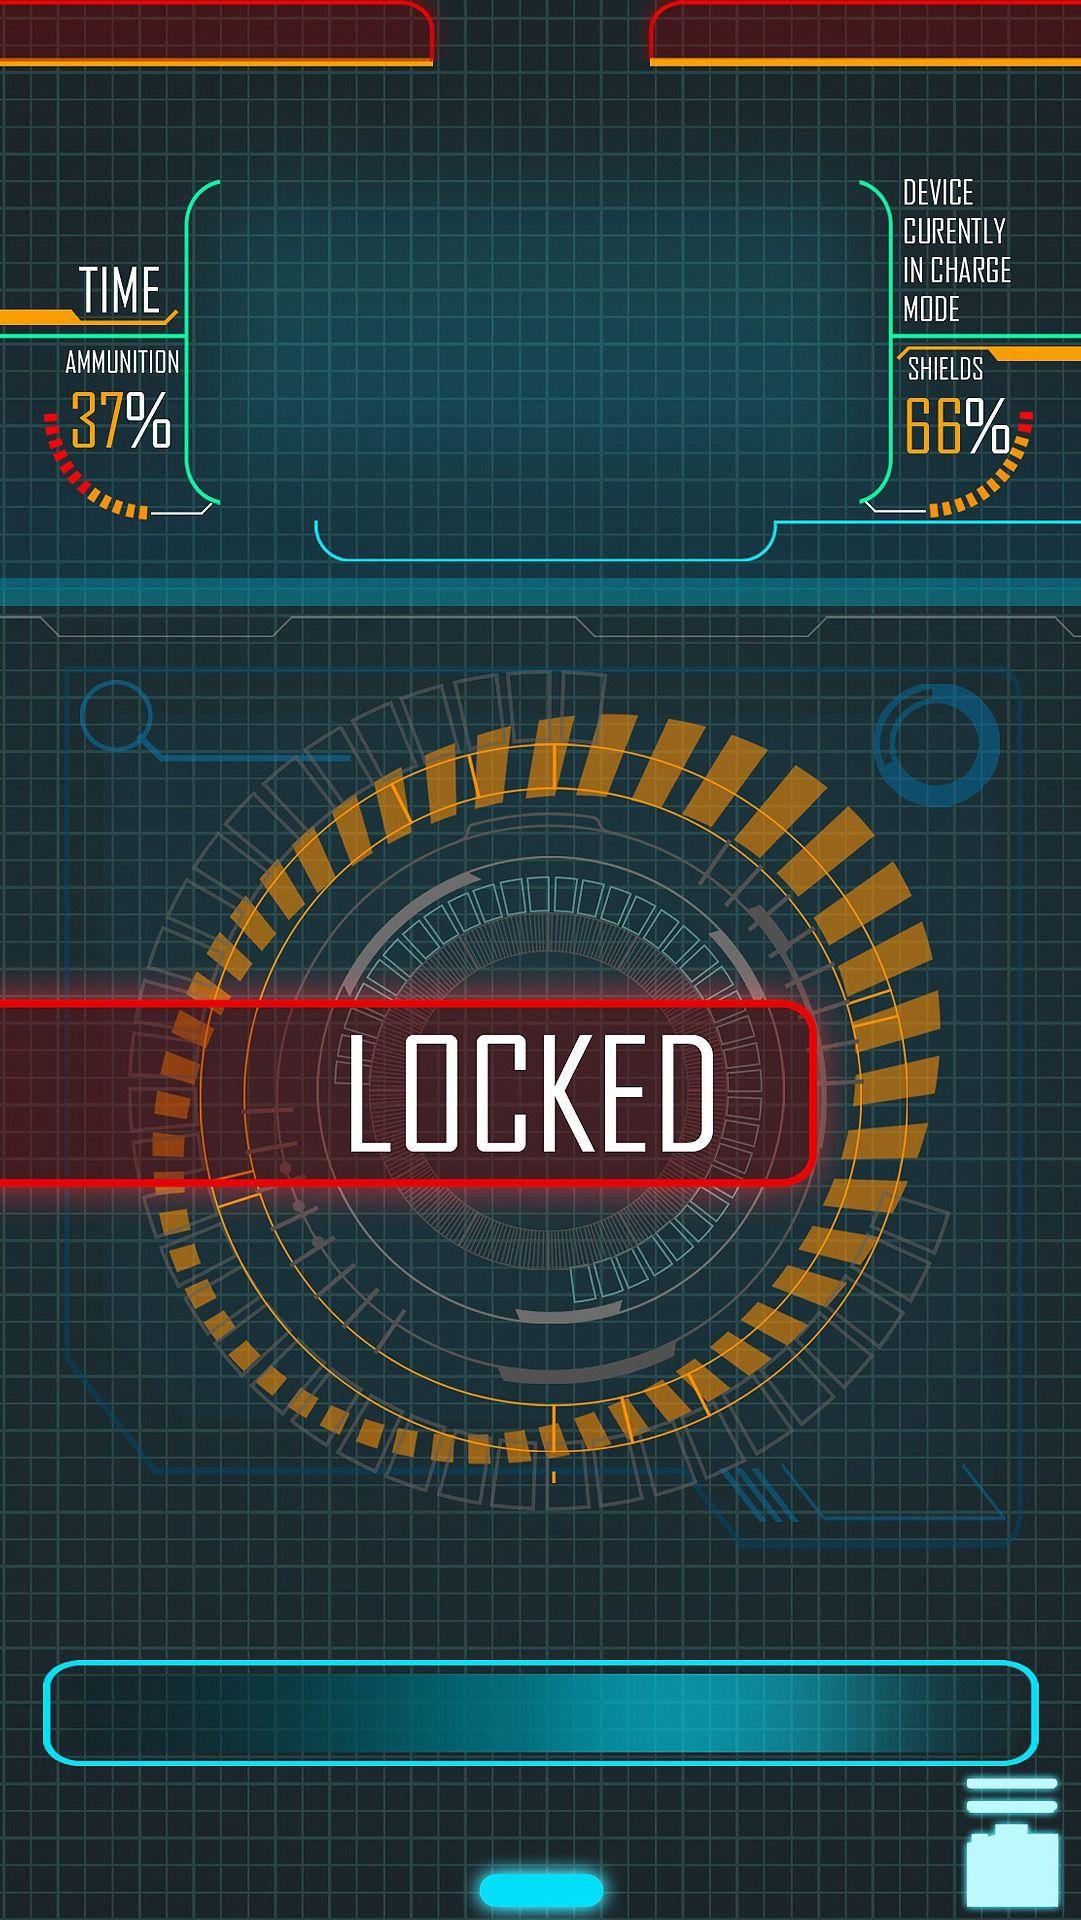 hacker logo iphone wallpaper